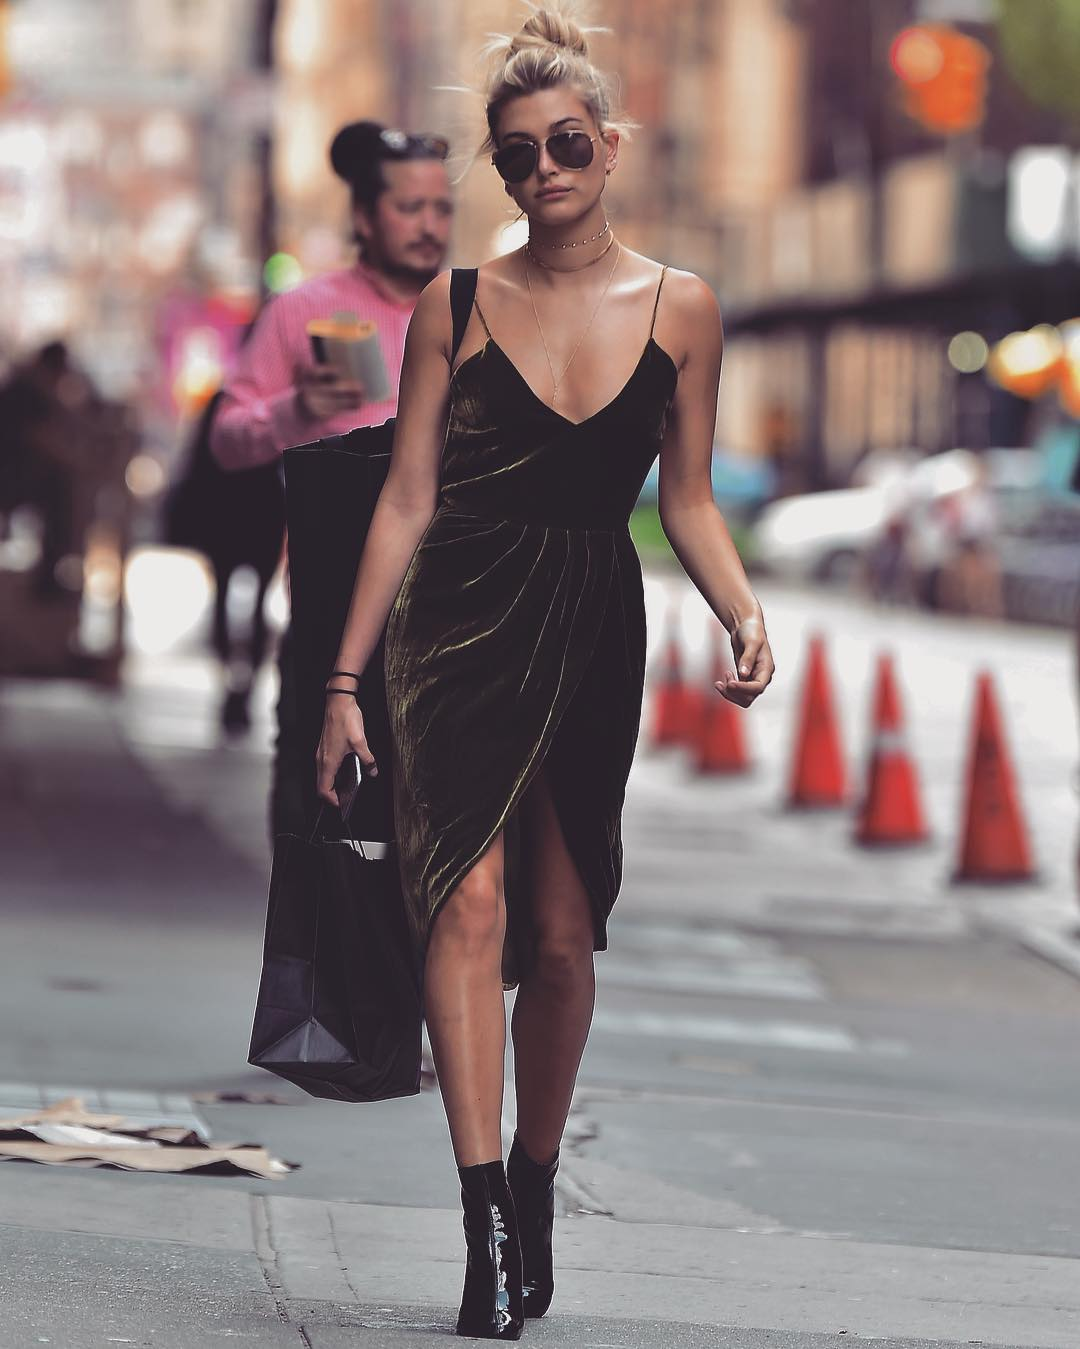 Hailey Baldwin wears a green velvet dress by Vatanika.